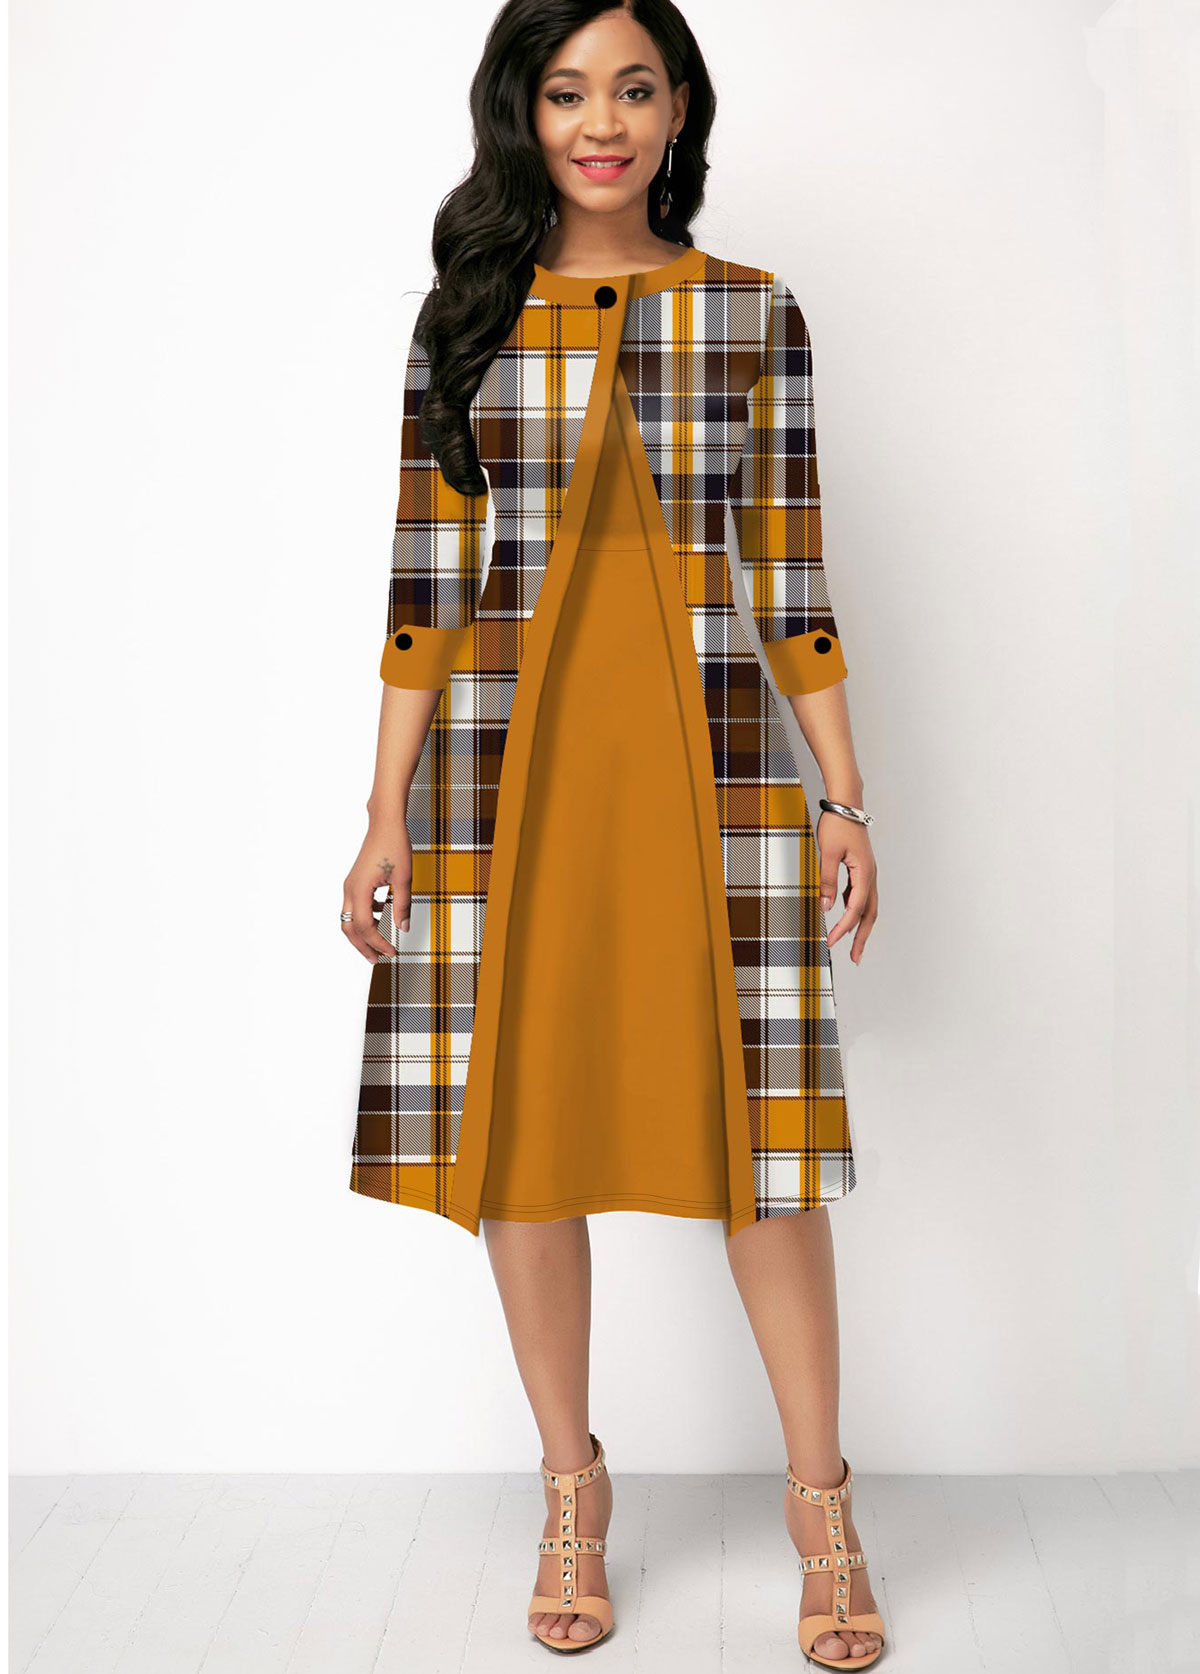 ROTITA Plaid Print Contrast Three Quarter Sleeve Dress